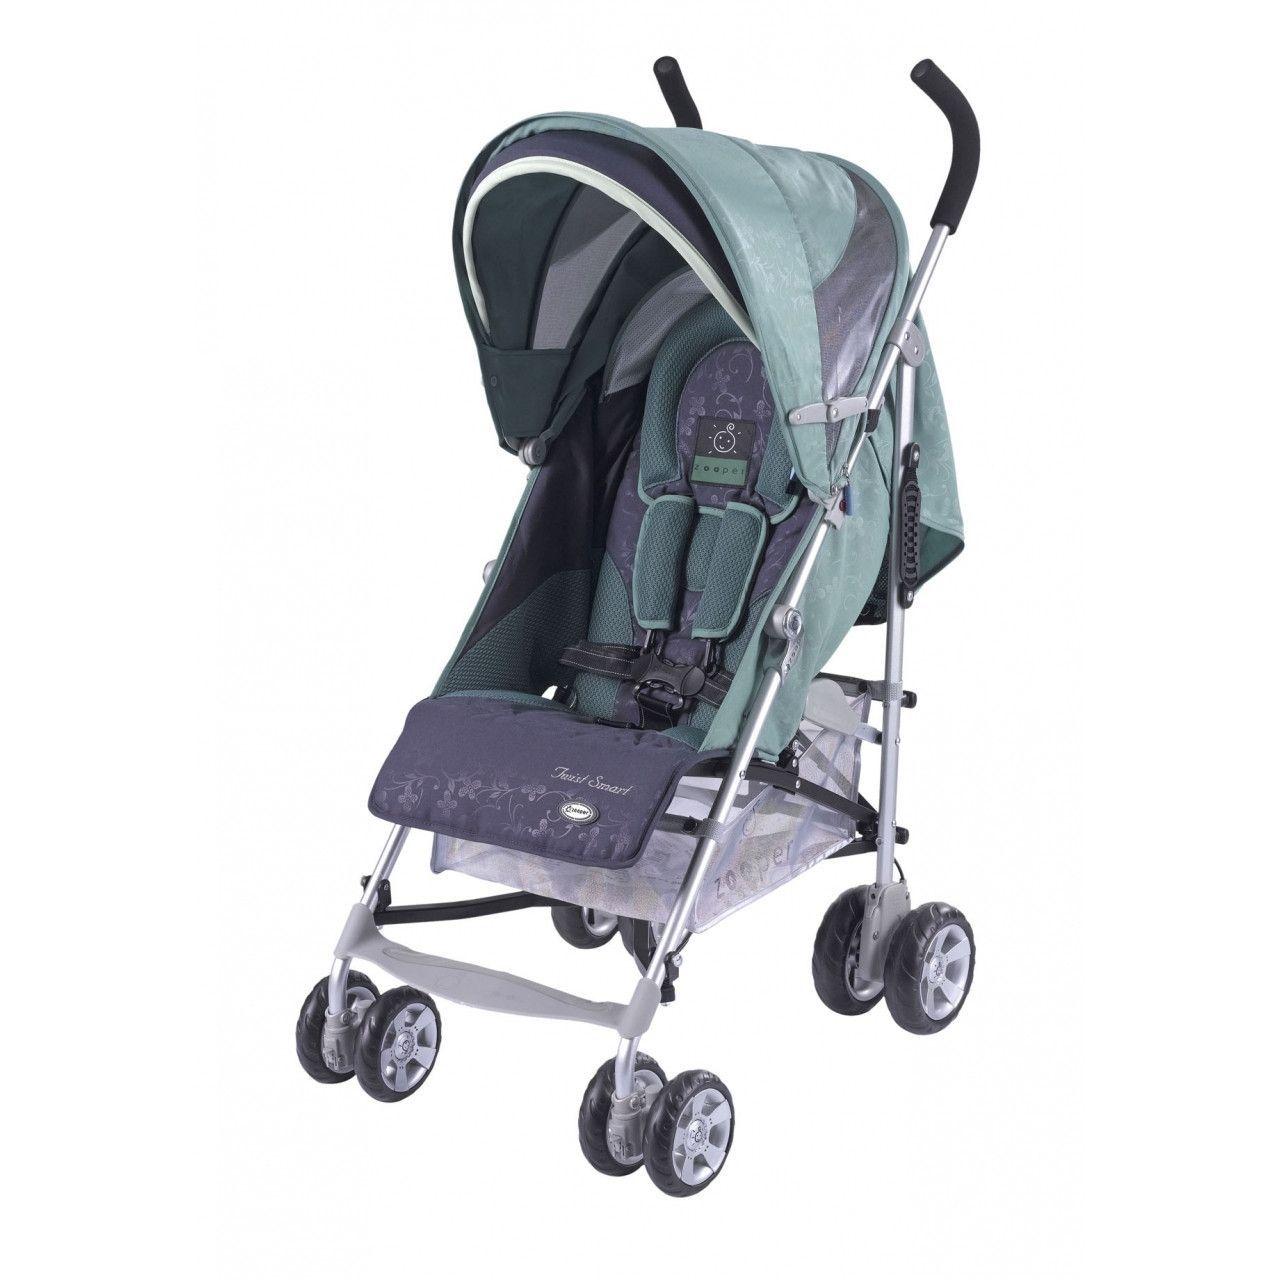 Zooper Twist Smart Umbrella Stroller Tealberry